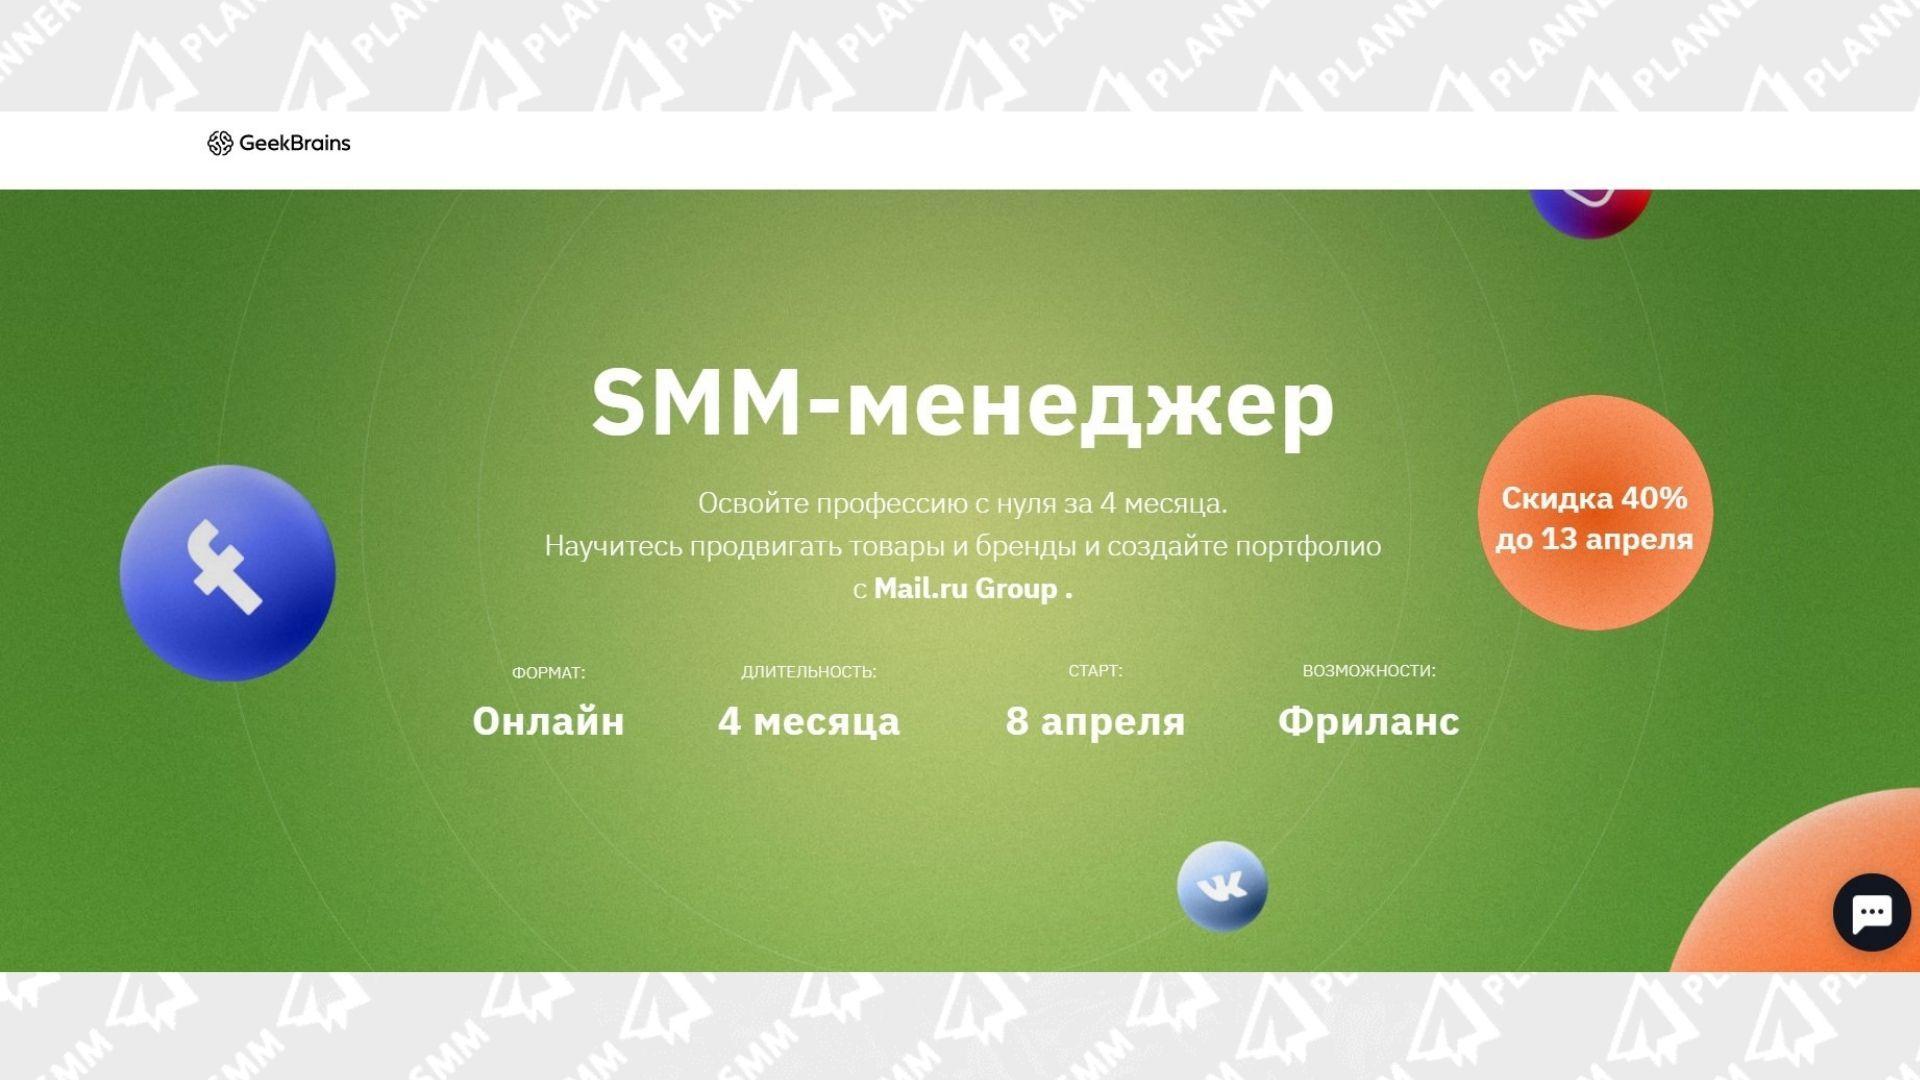 Курс «SMM-менеджер» от GeekBrains